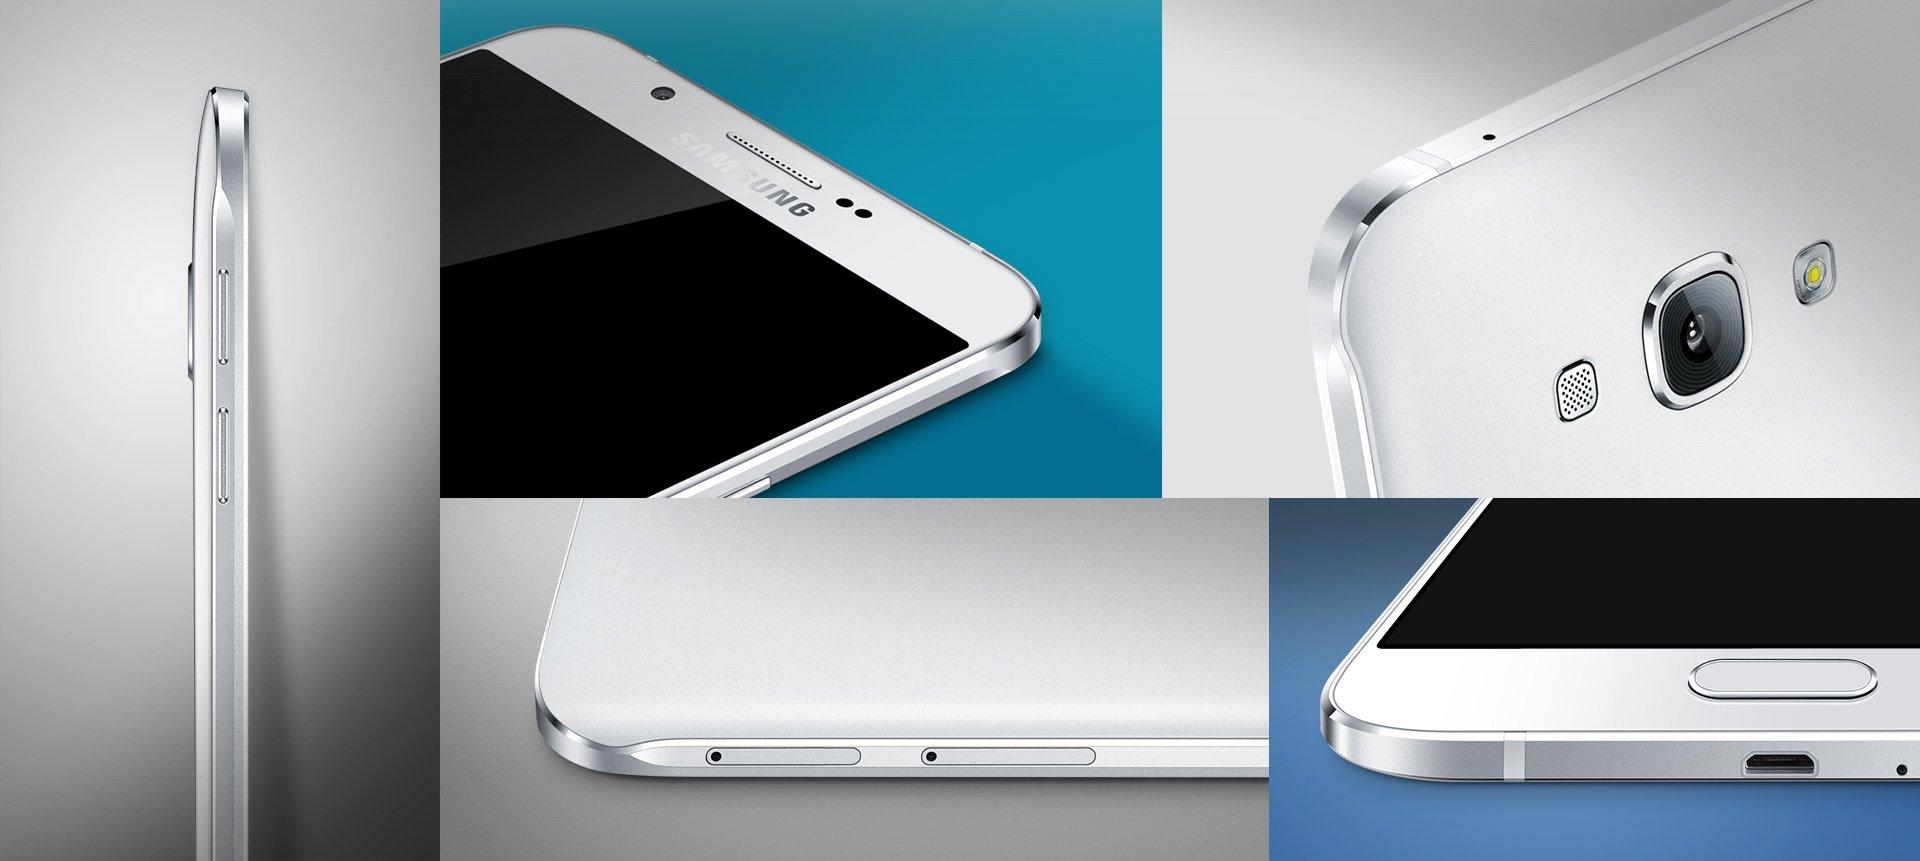 Tabletowo.pl Samsung Galaxy A8 (2016) coraz bliżej premiery Android Samsung Smartfony